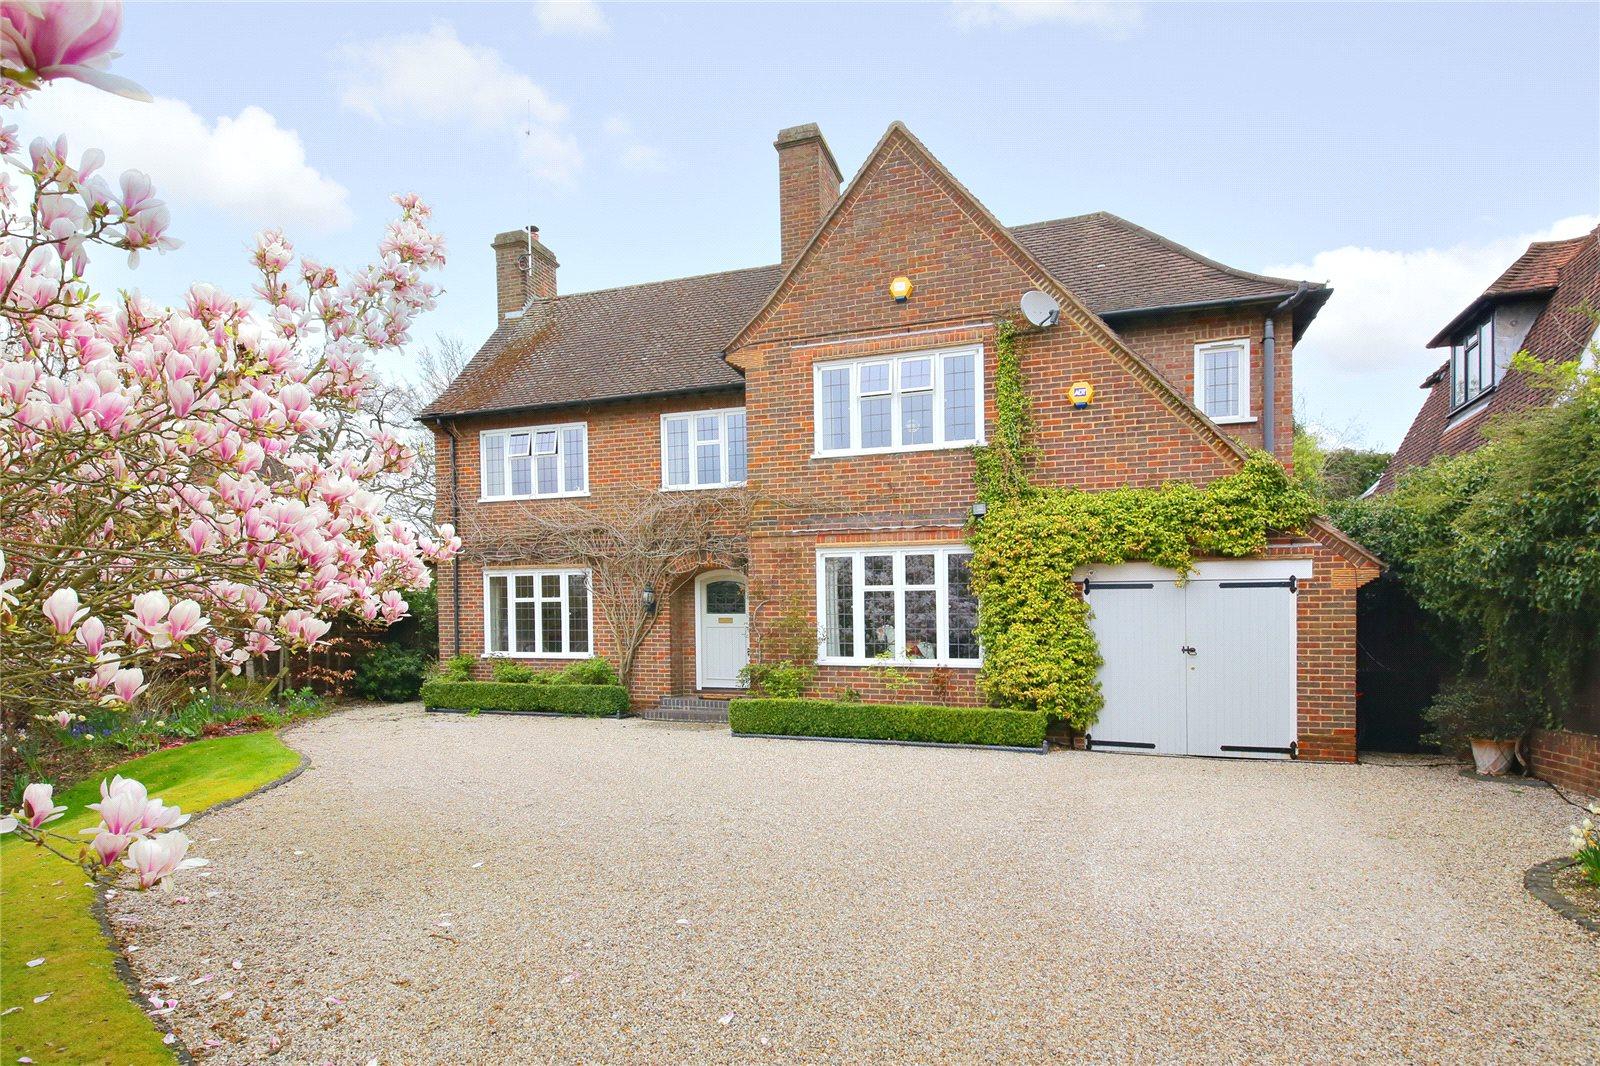 Частный дом для того Продажа на Canons Close, Radlett, Hertfordshire, WD7 Radlett, Англия